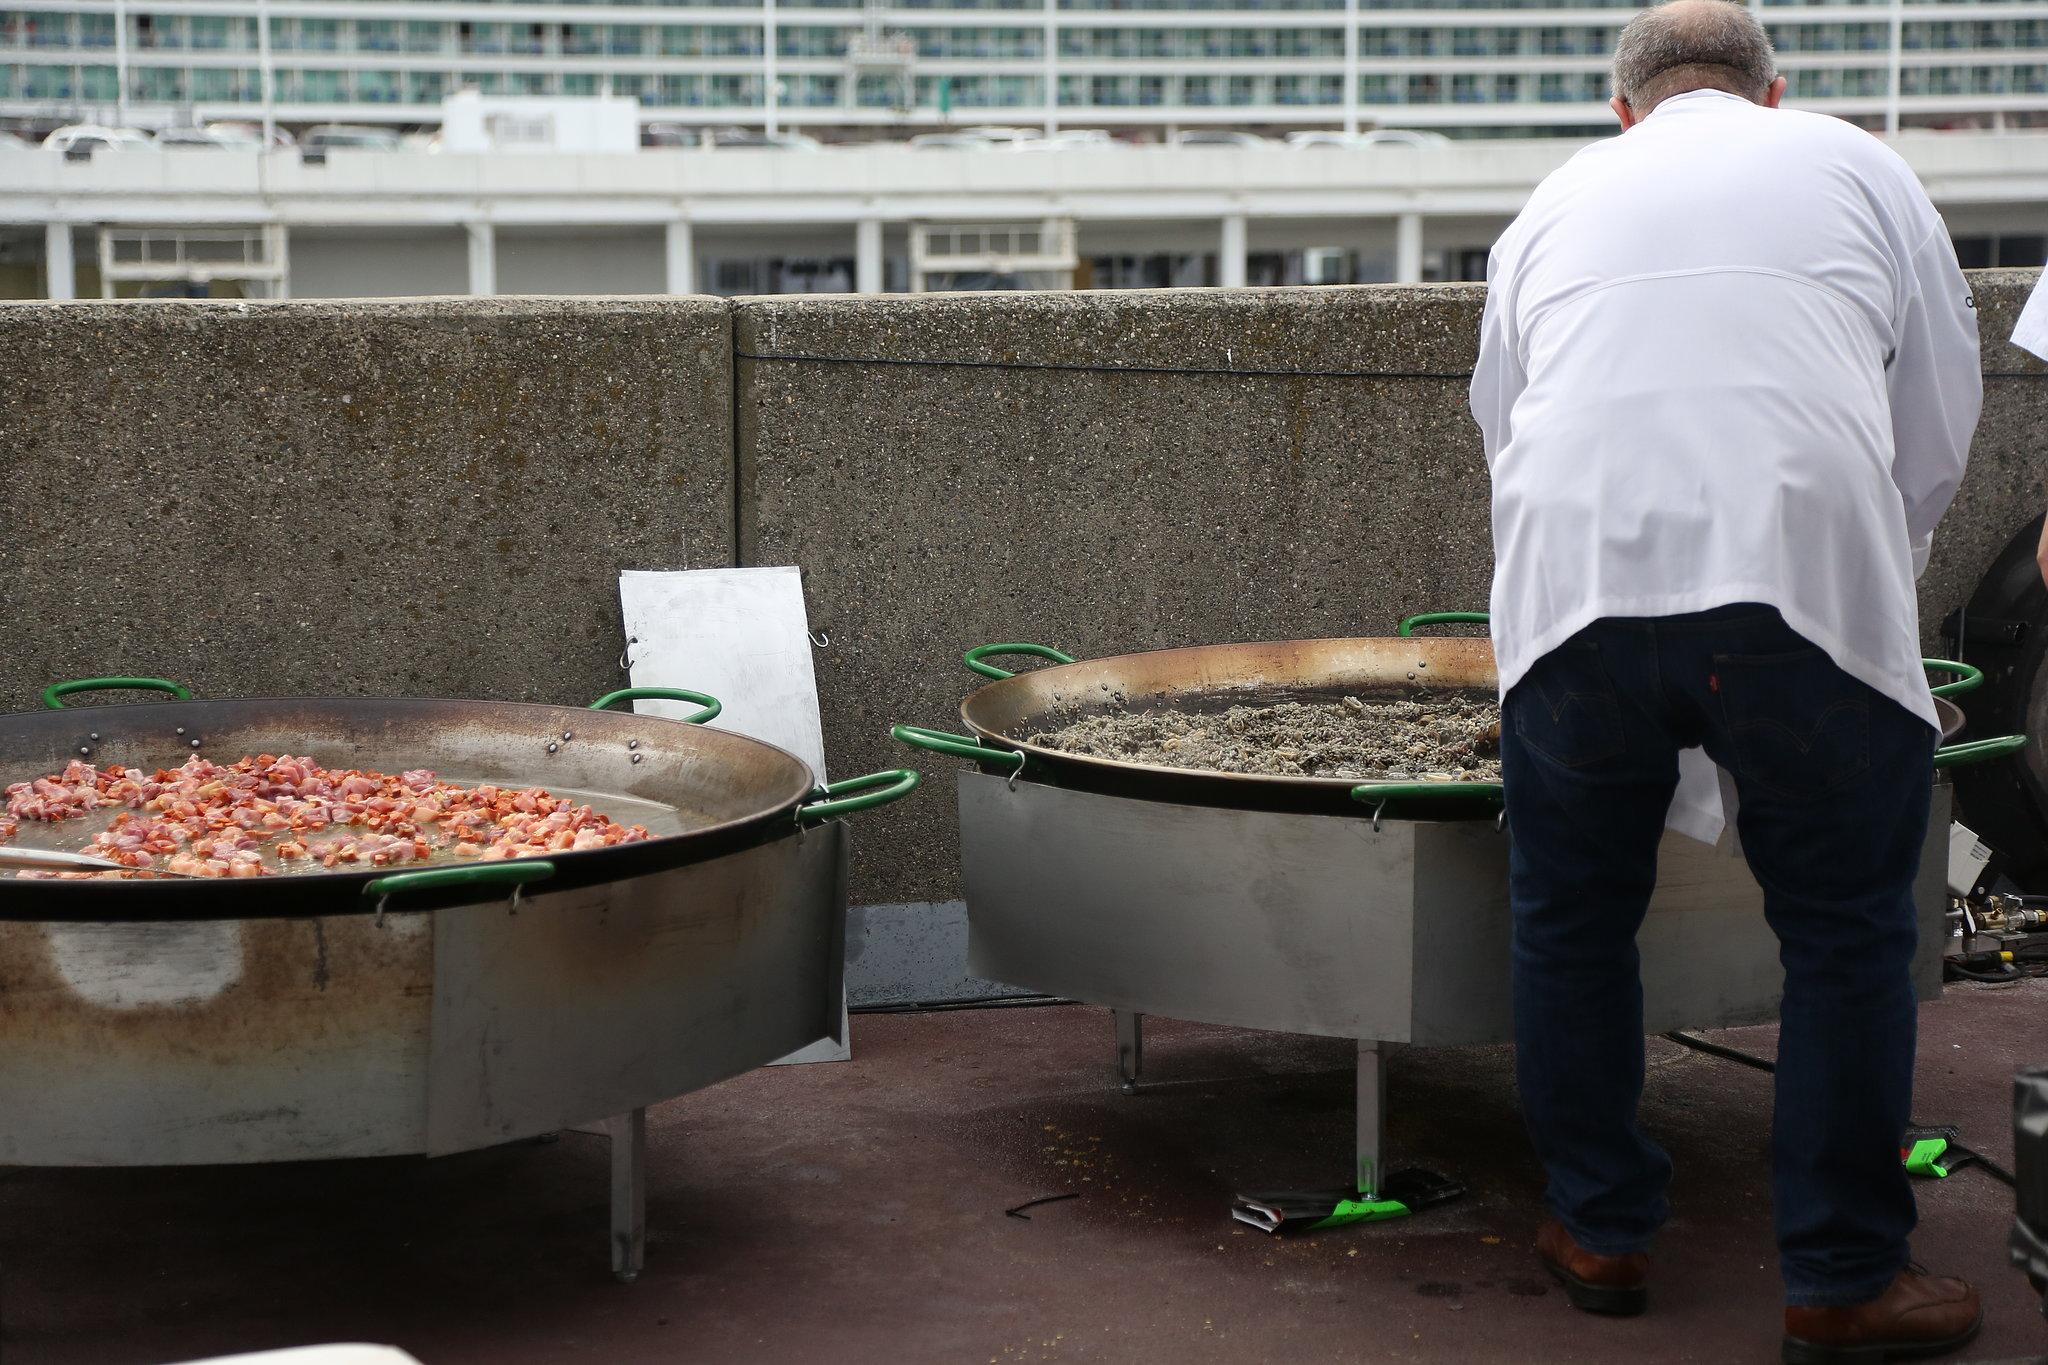 Giant Paella Pans